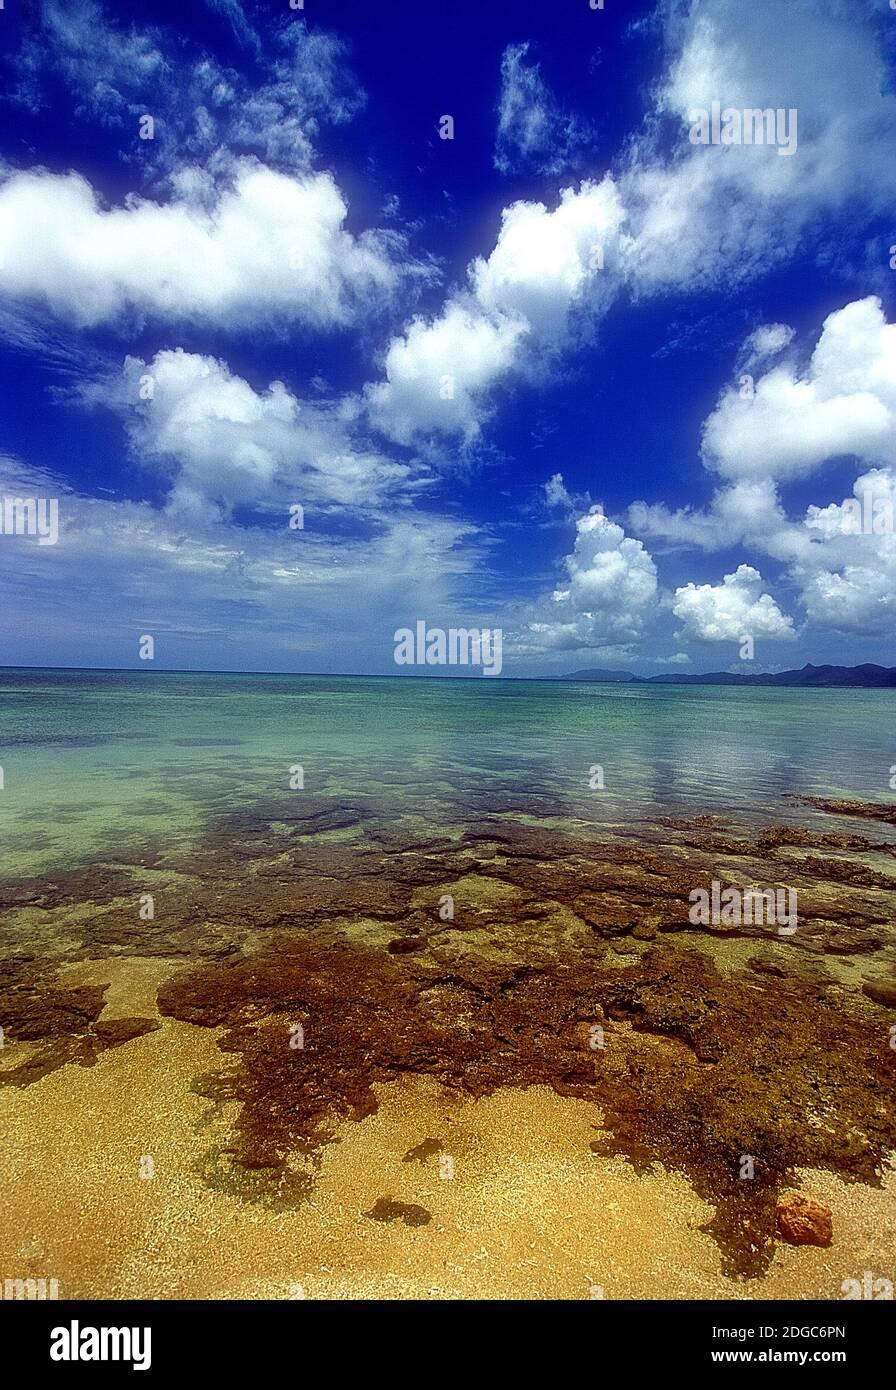 Yonehara Beach, Low Tide,  Ishigaki, Yahema Islands, Ryukyu Islands, Okinawa, Japan Stock Photo